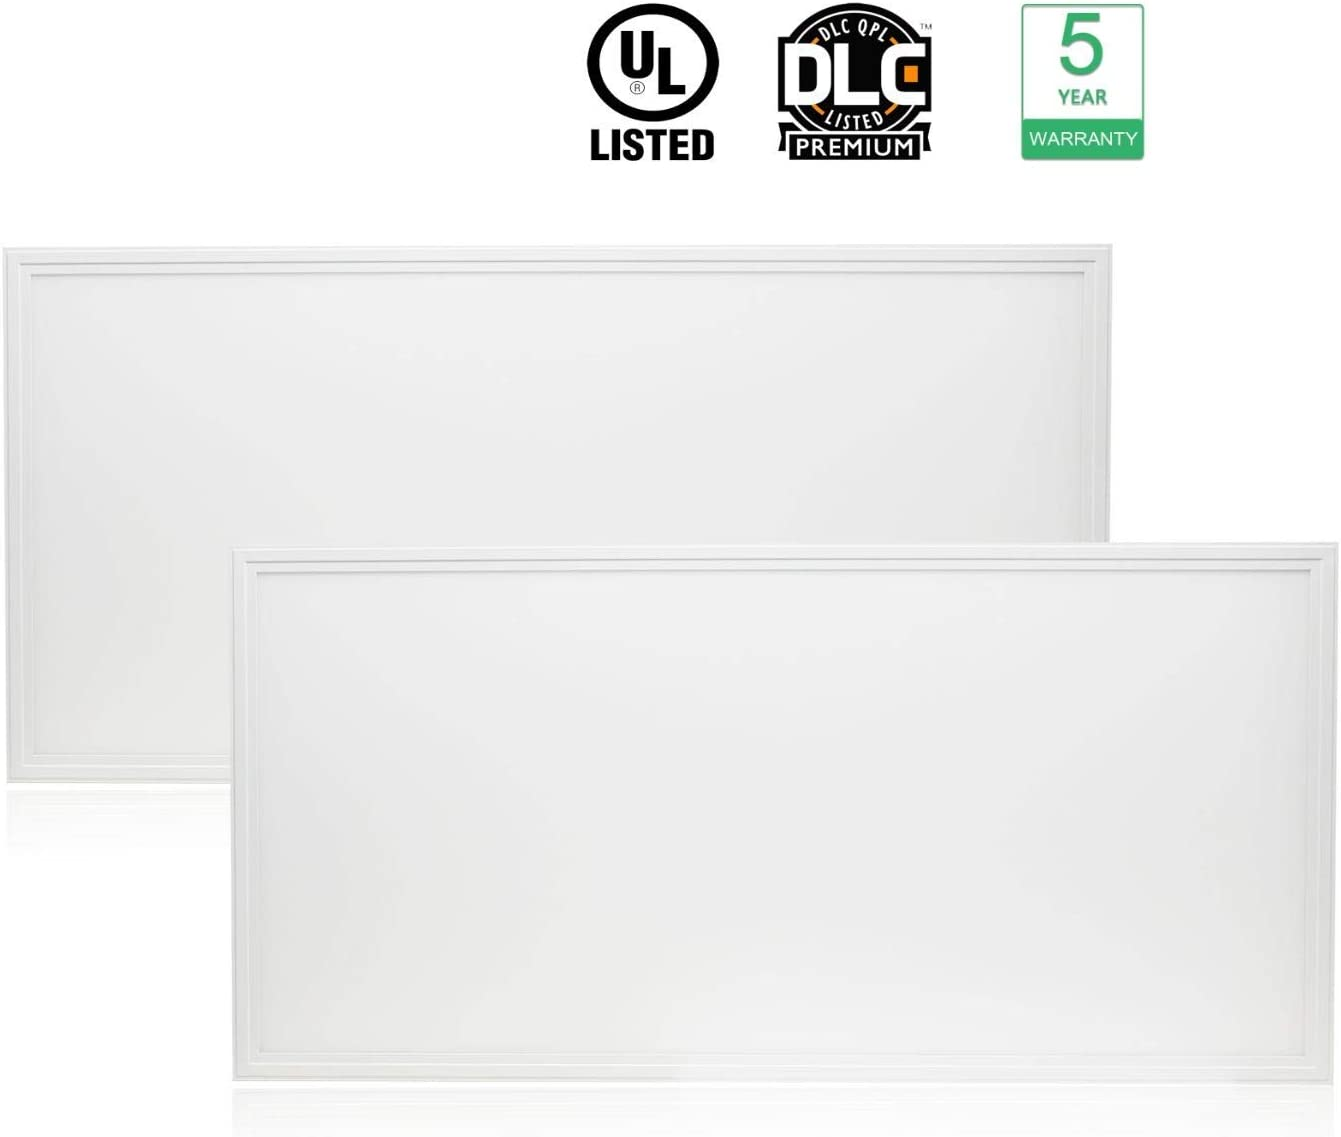 Cortelco LED Panel Light, Troffer Drop Ceiling Flat Panel Light 2x4FT, Dimmable 0-10V Edge-Lit Light Fixture, 48W, 6240Lumens, 5000K, DLC&UL Listed, 2 Pack